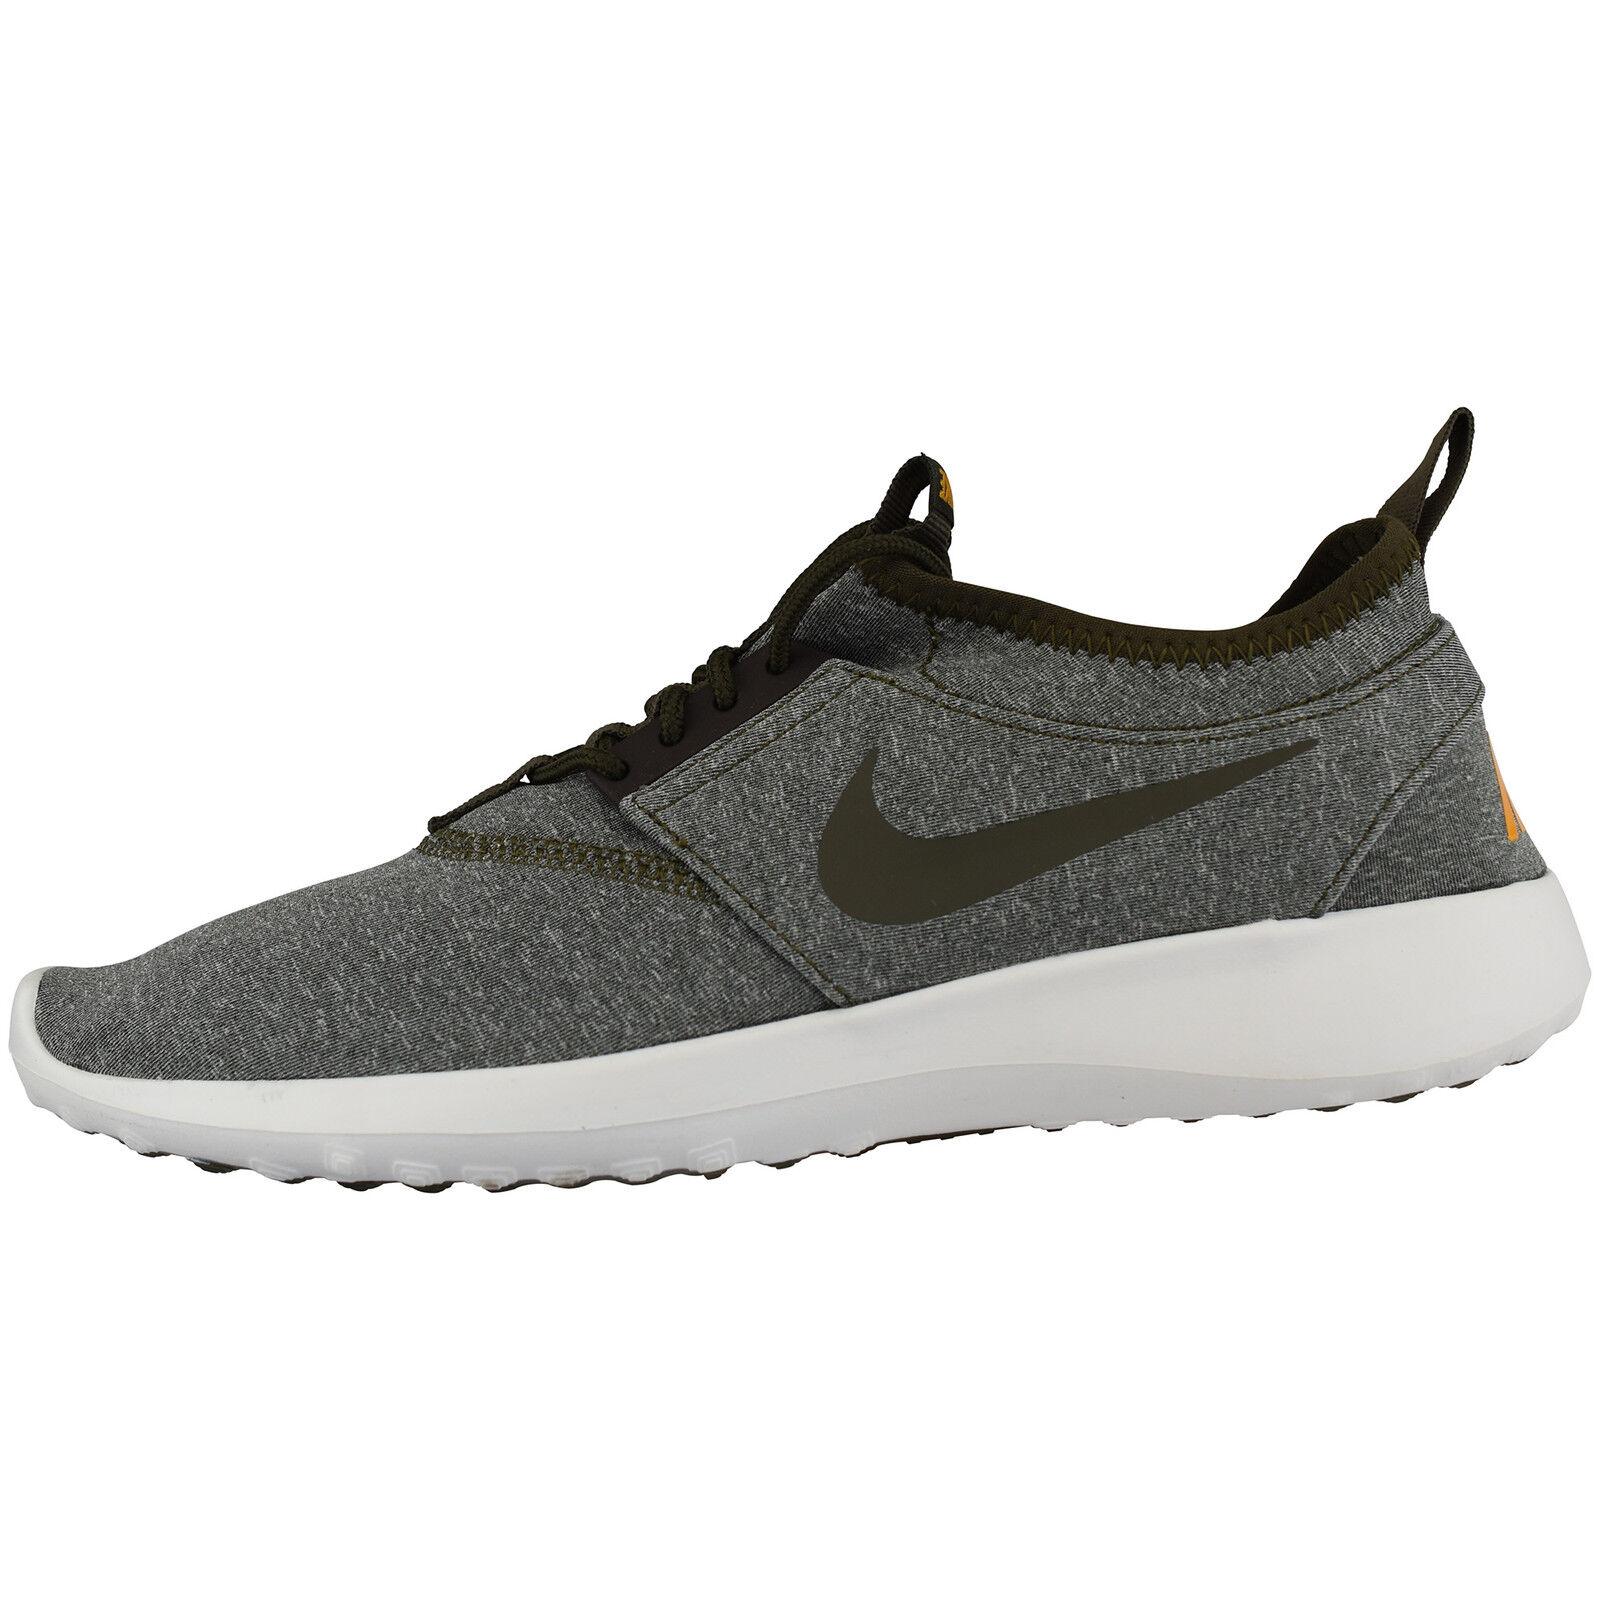 WMNS WMNS WMNS NIKE juvenate se 862335-300 LIFESTYLE Scarpe da corsa running tempo libero Sneaker 058537